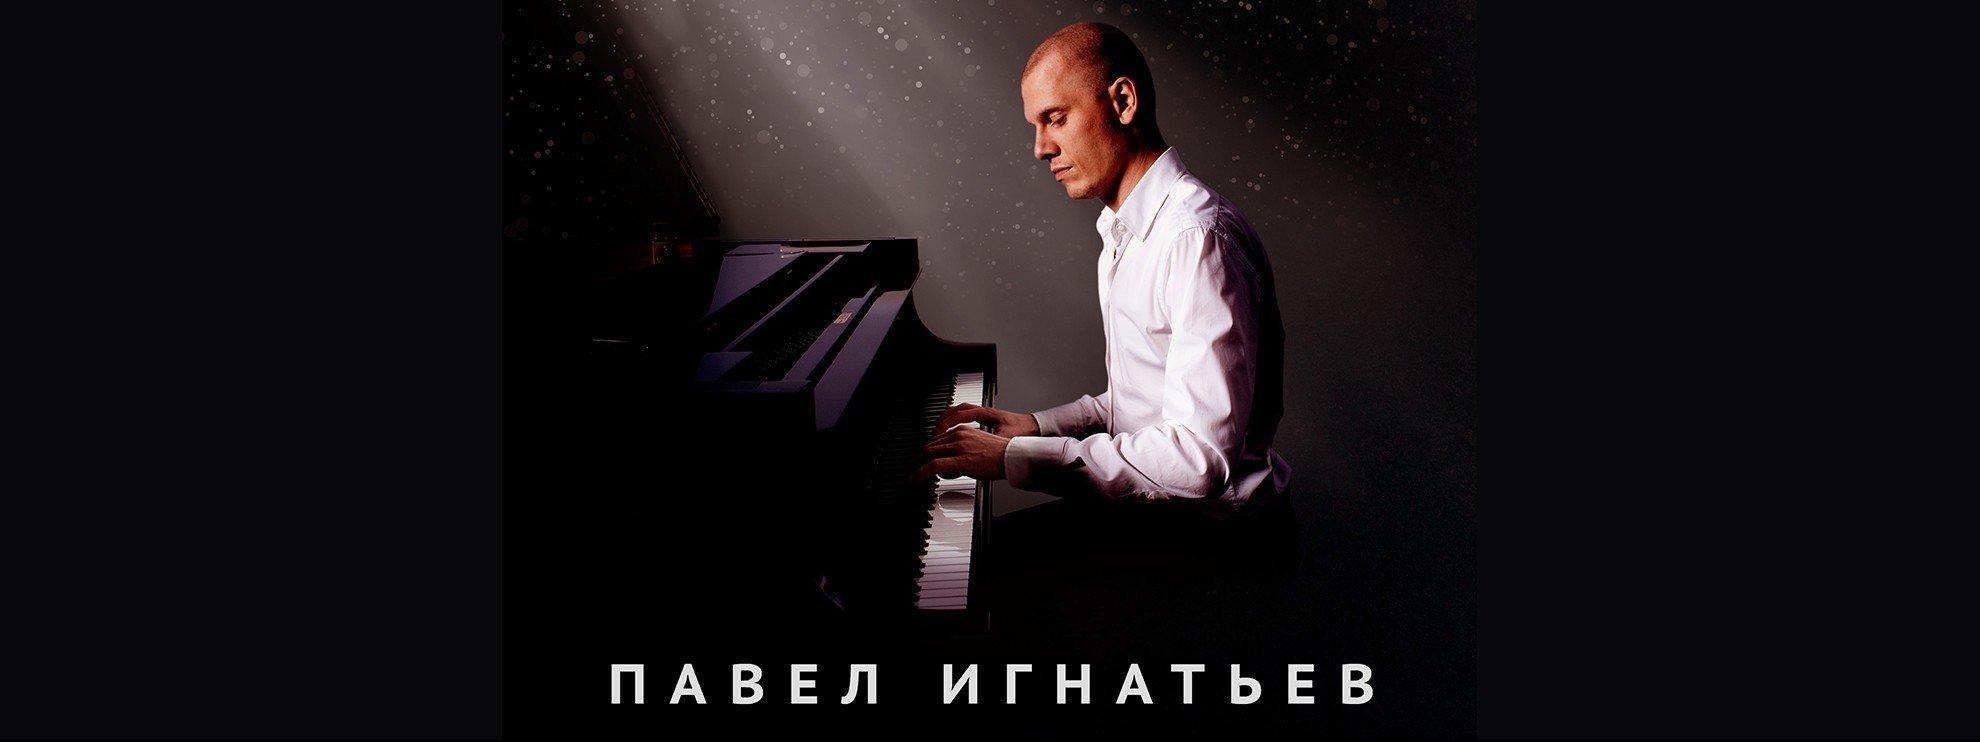 performer Pavel Ignatiev